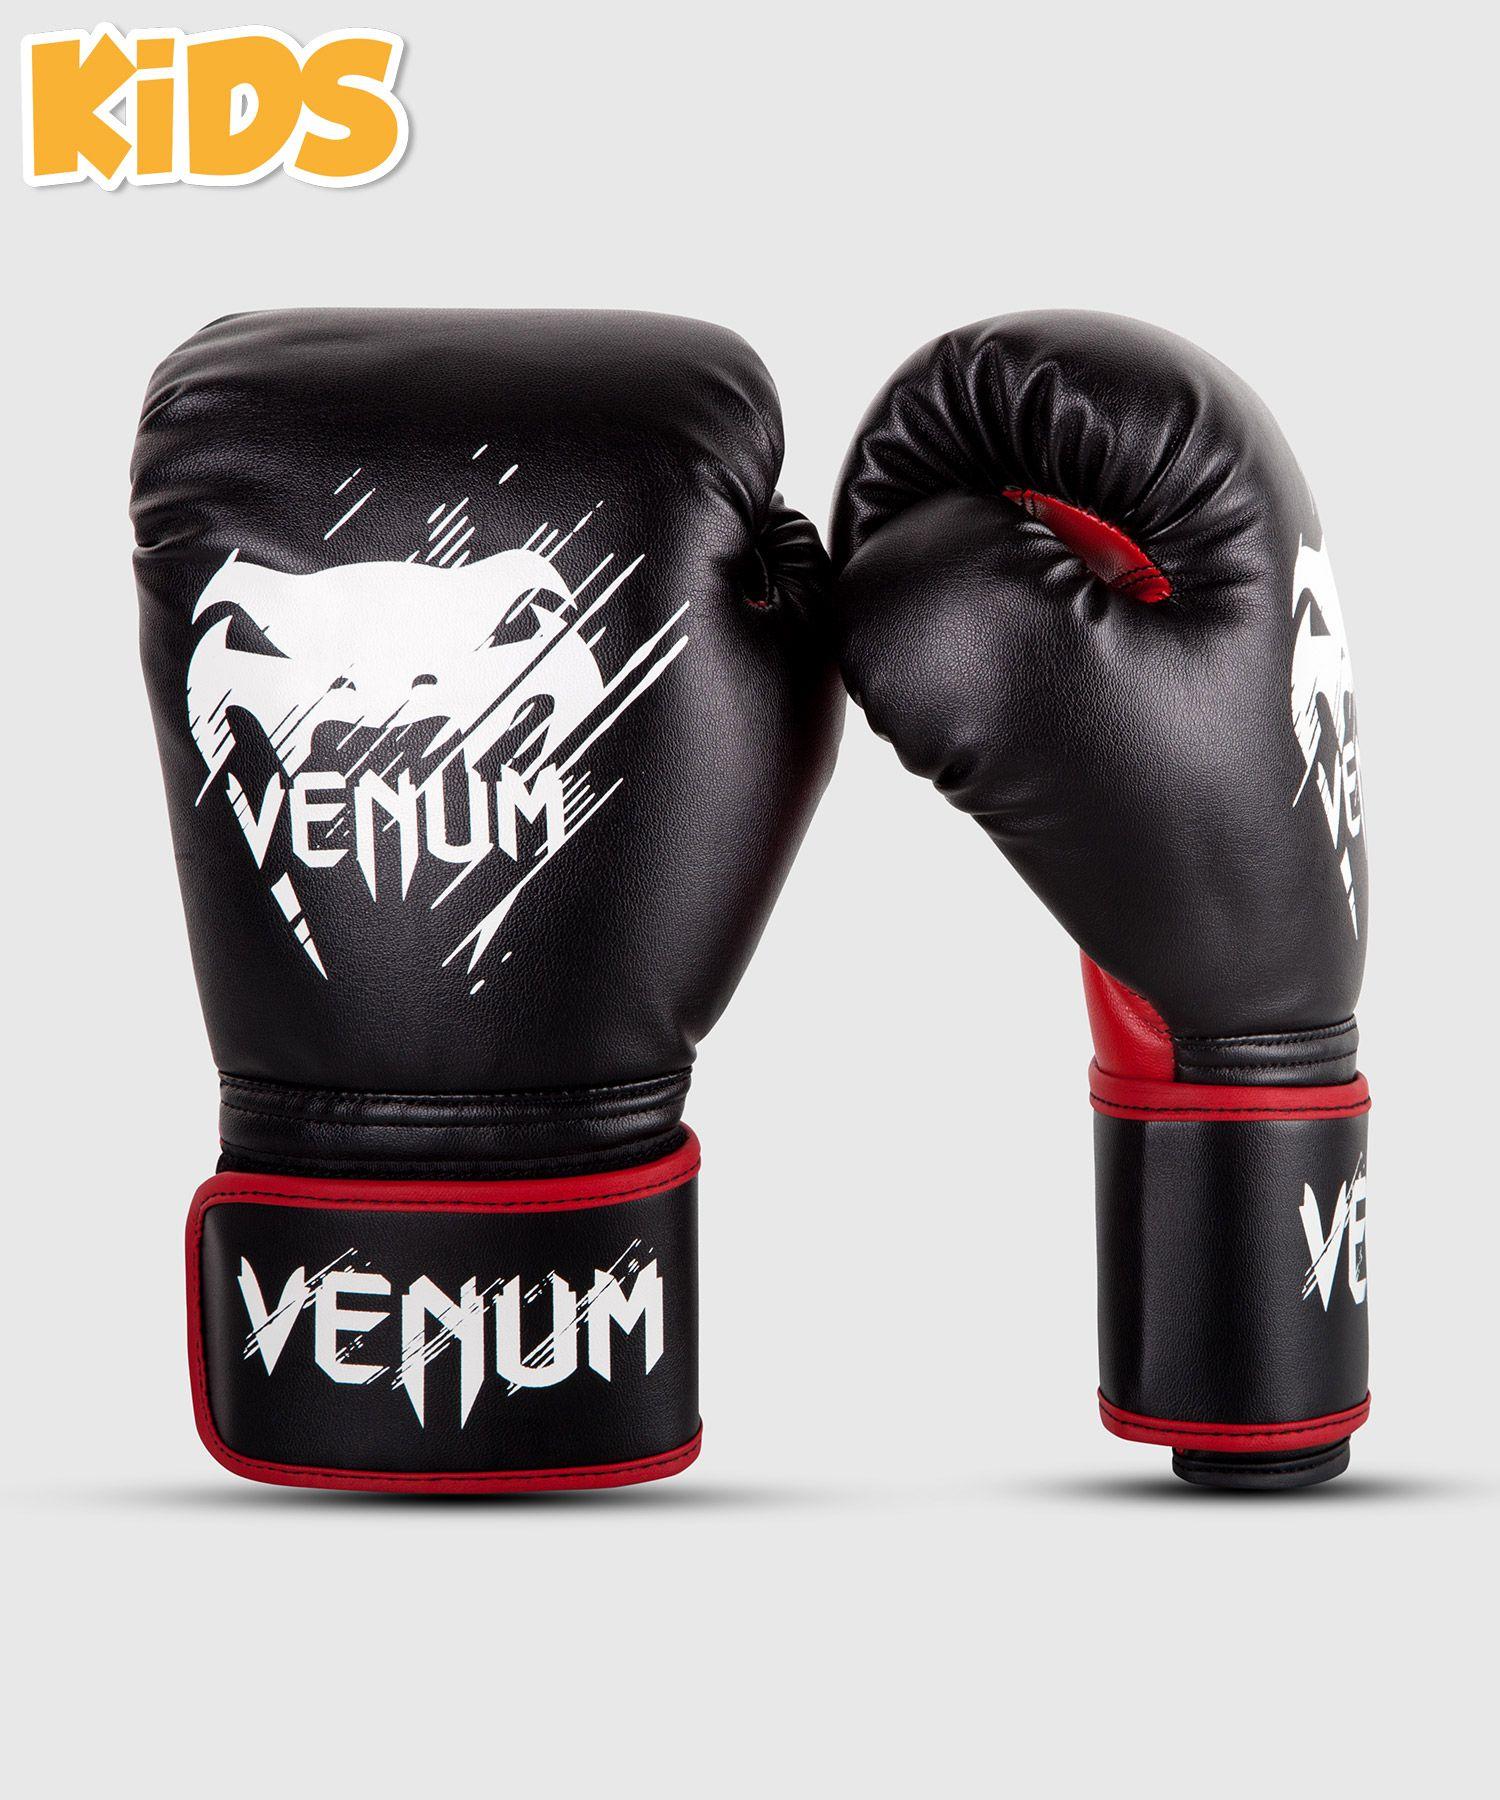 Venum Contender Kids Boxhandschuhe - Schwarz/Rot